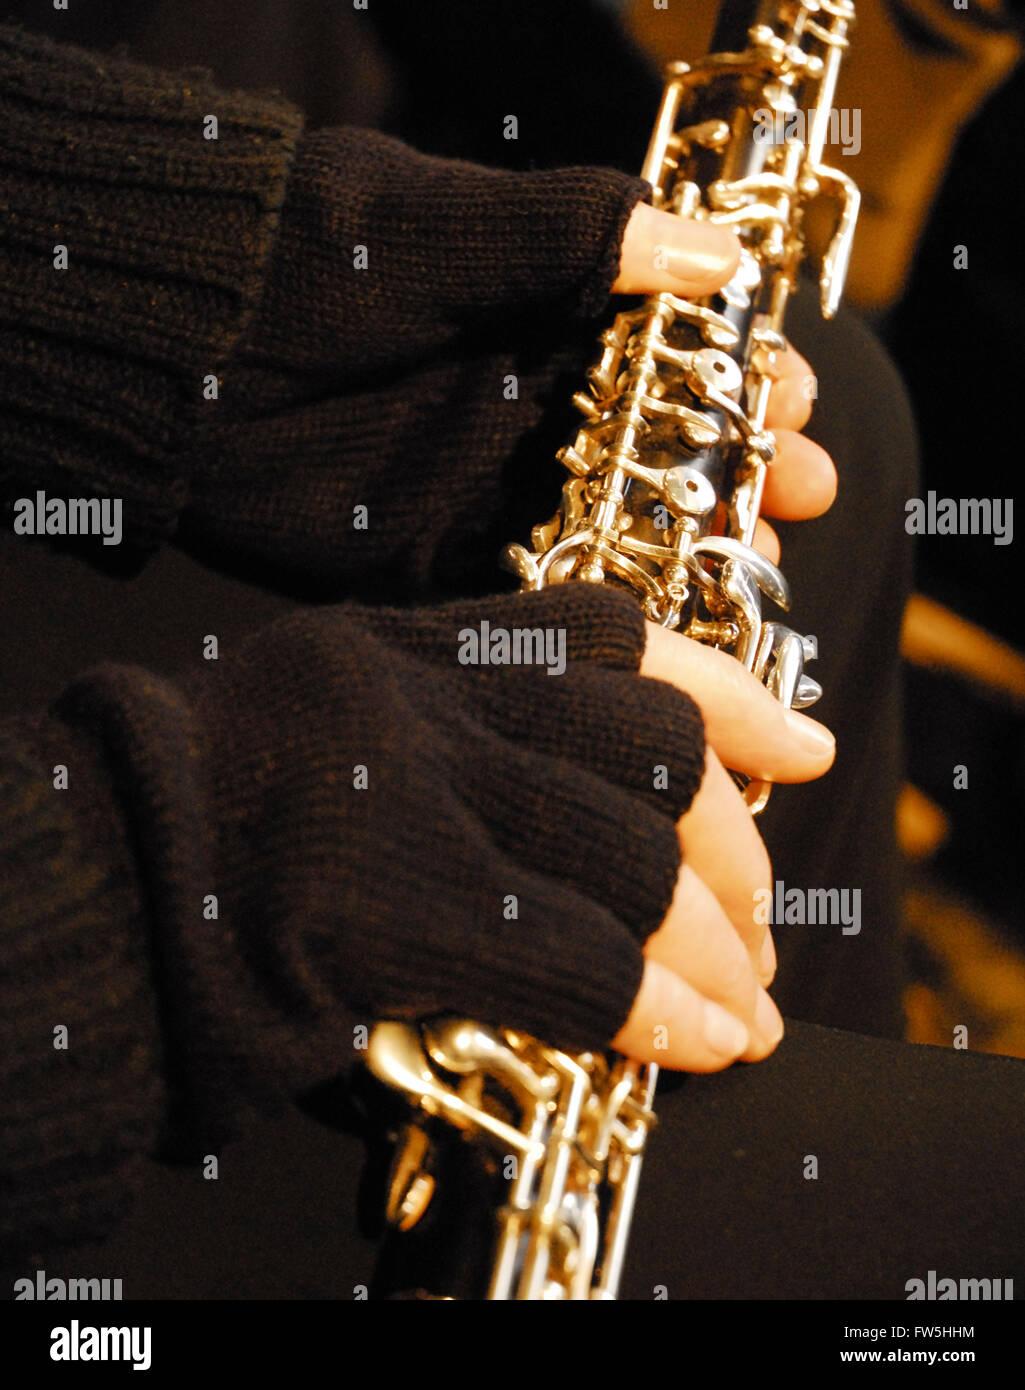 Cold concerts, black half-finger mitts to warm hands of oboist in cold concerts - Stock Image